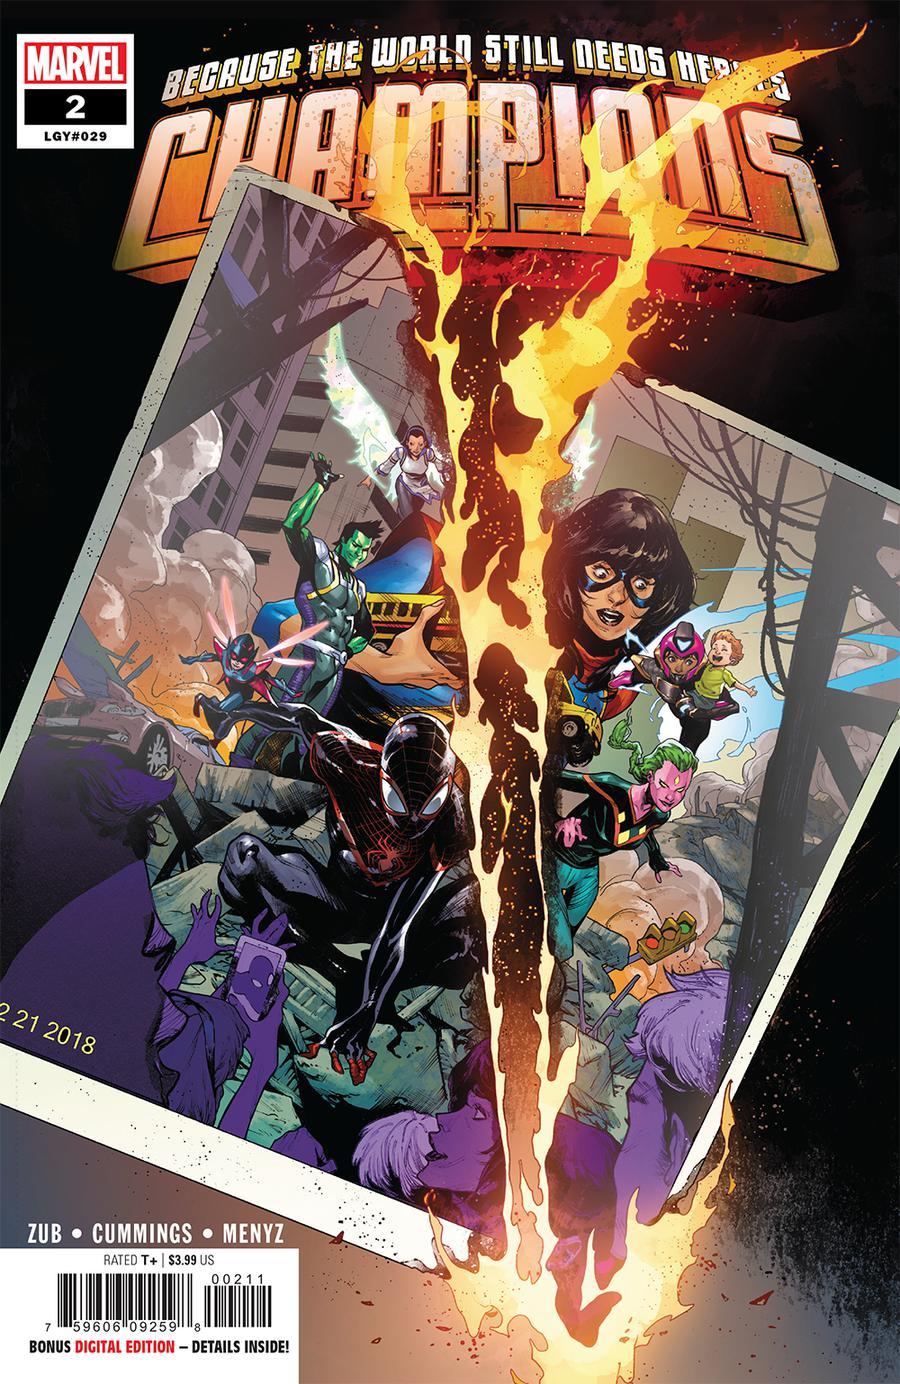 Champions (Marvel) Vol 3 #2 Cover A Regular Kim Jacinto Cover